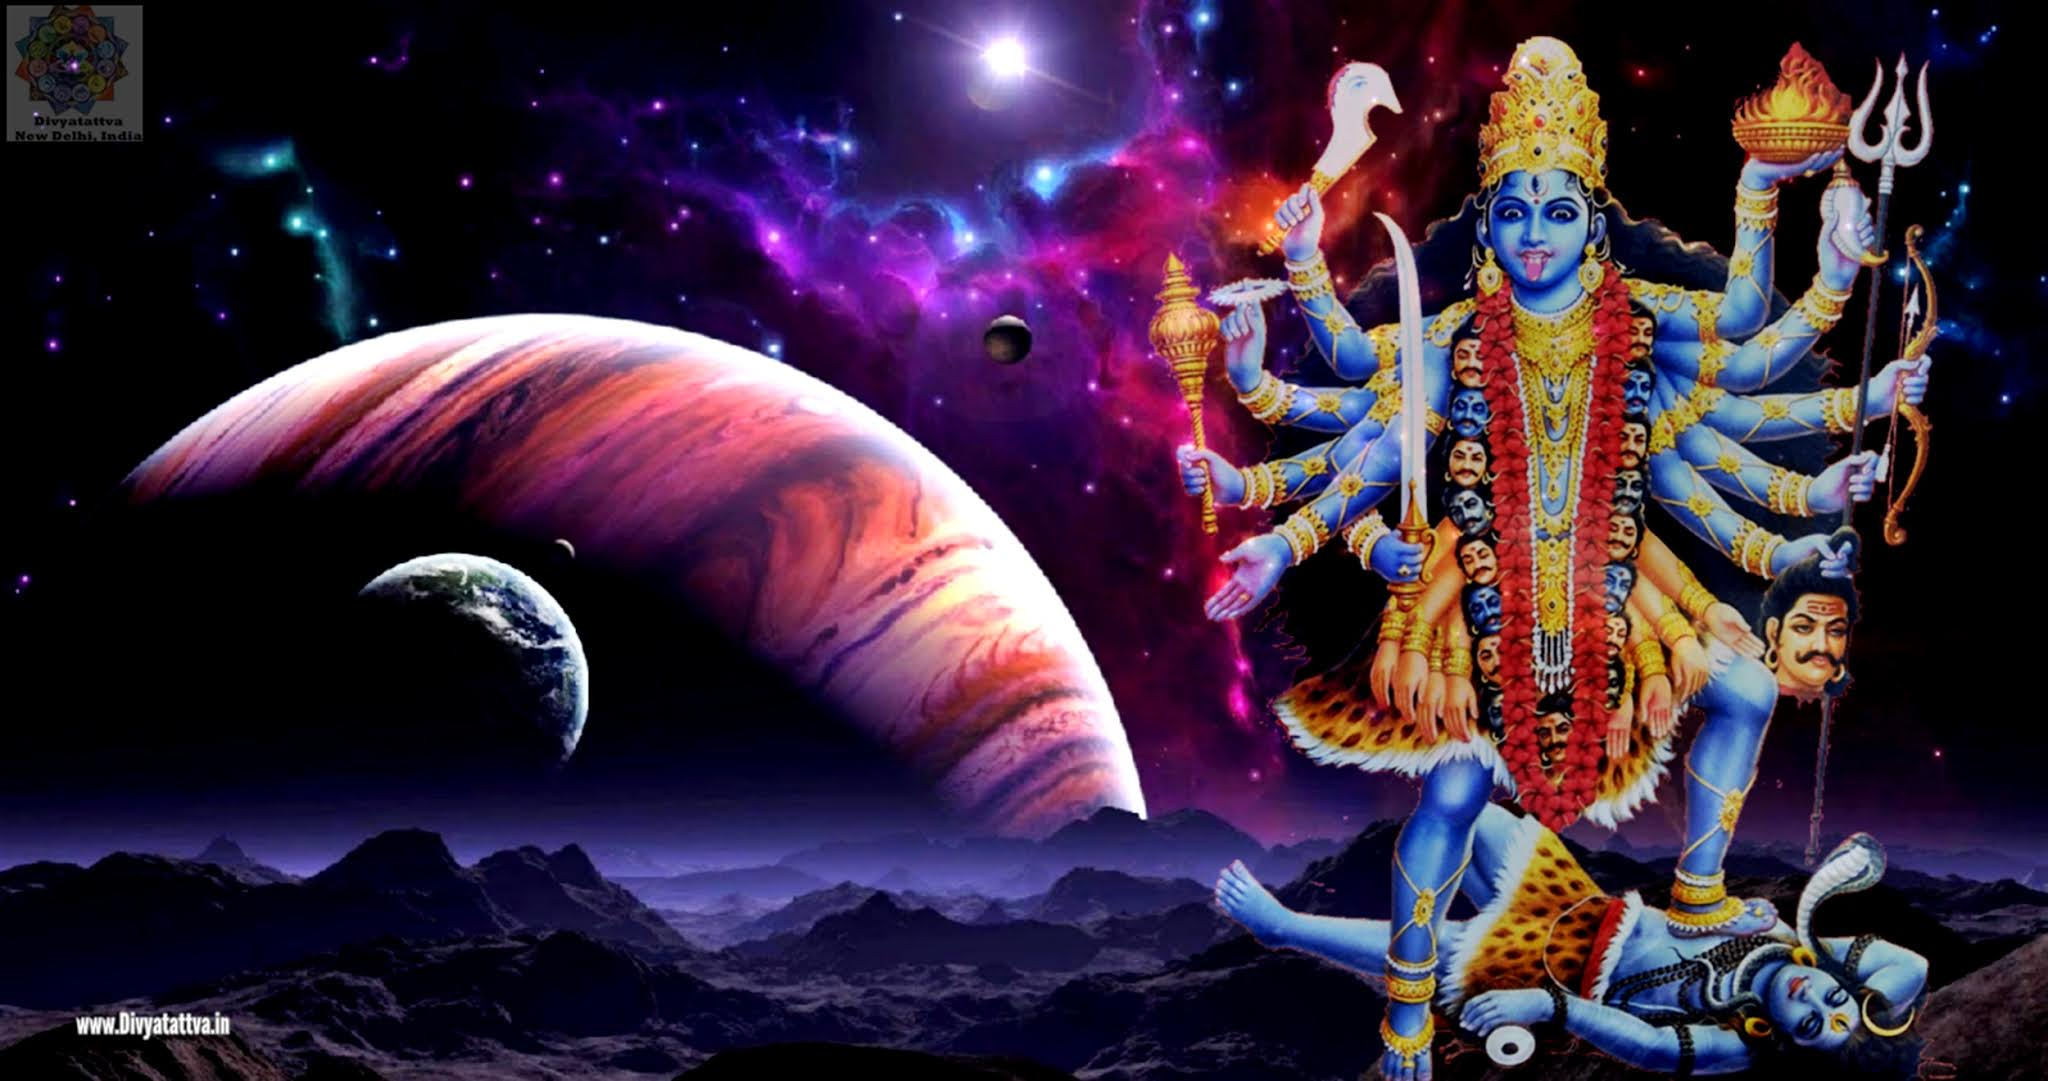 Kalika is a Hindu goddess wallpapers Kali is the chief of the Mahavidyas